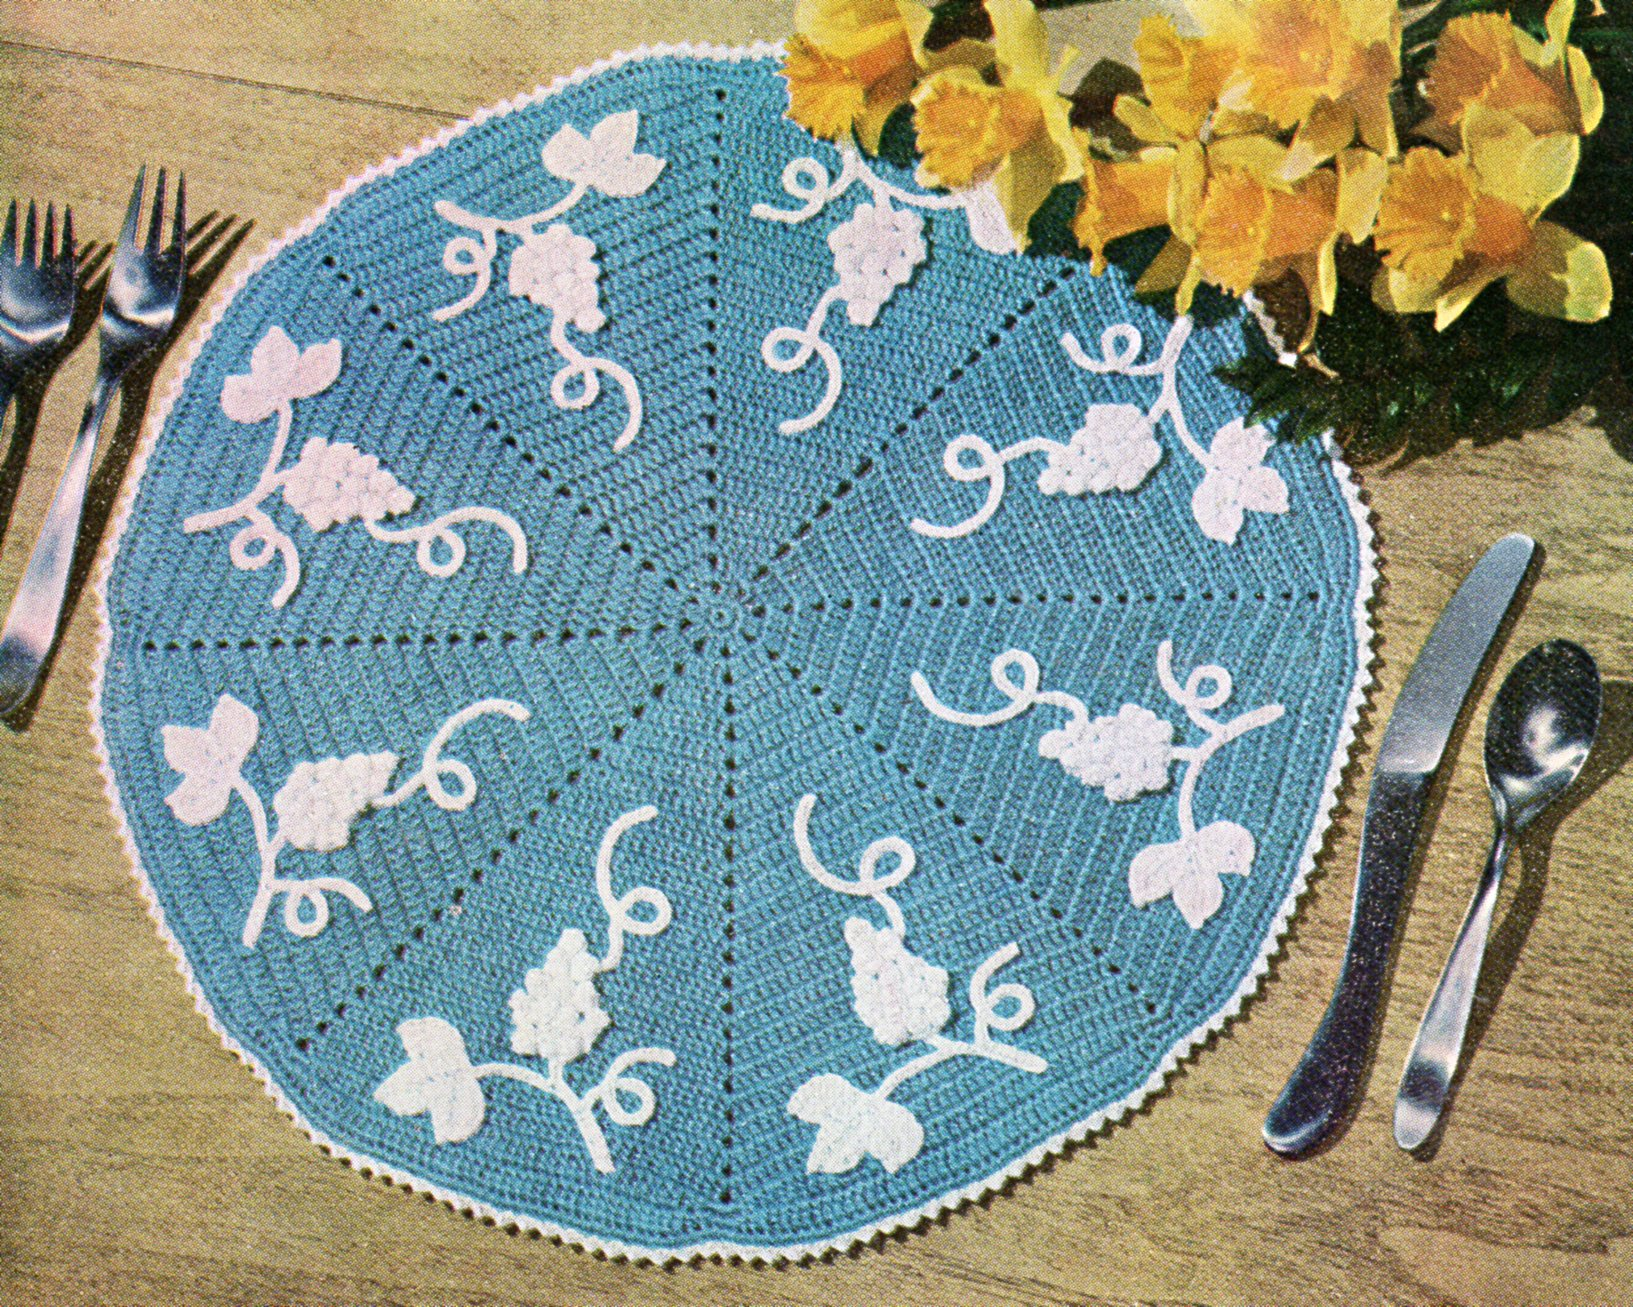 Vintage Crafts and More - Free Vintage Craft Patterns: Sewing ...